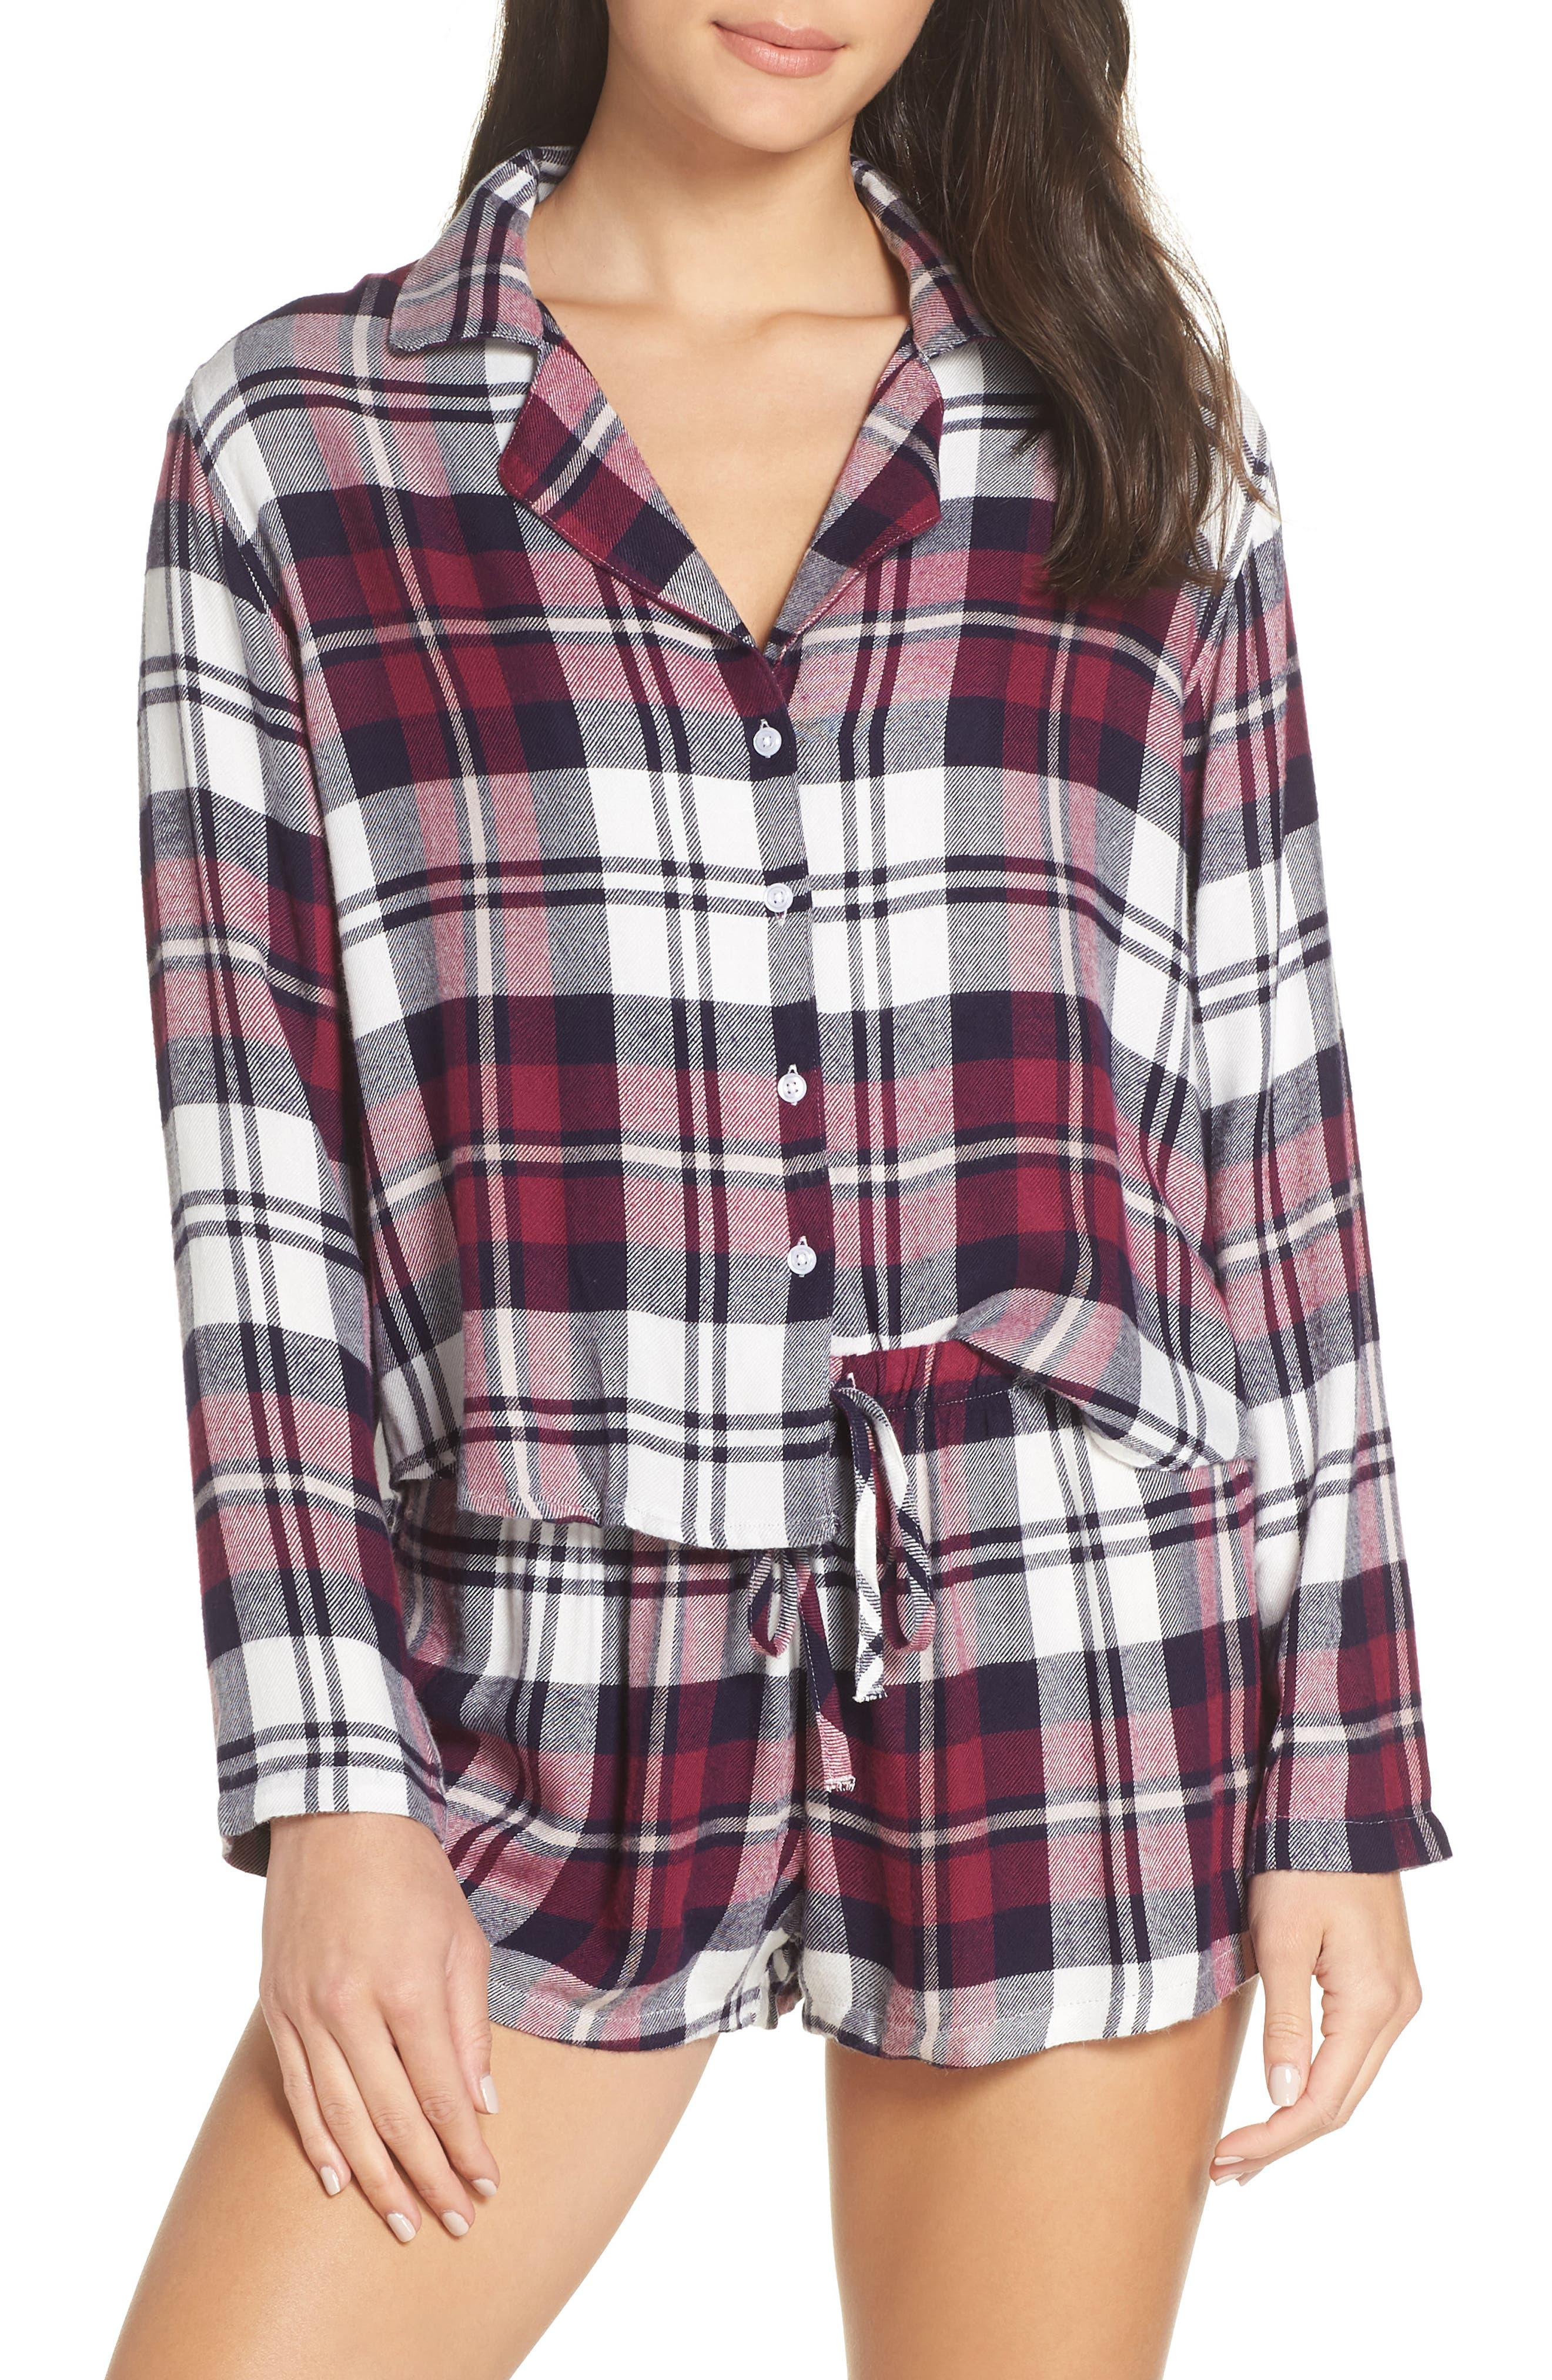 Plaid Short Pajamas,                         Main,                         color, MULBERRY NAVY WHITE